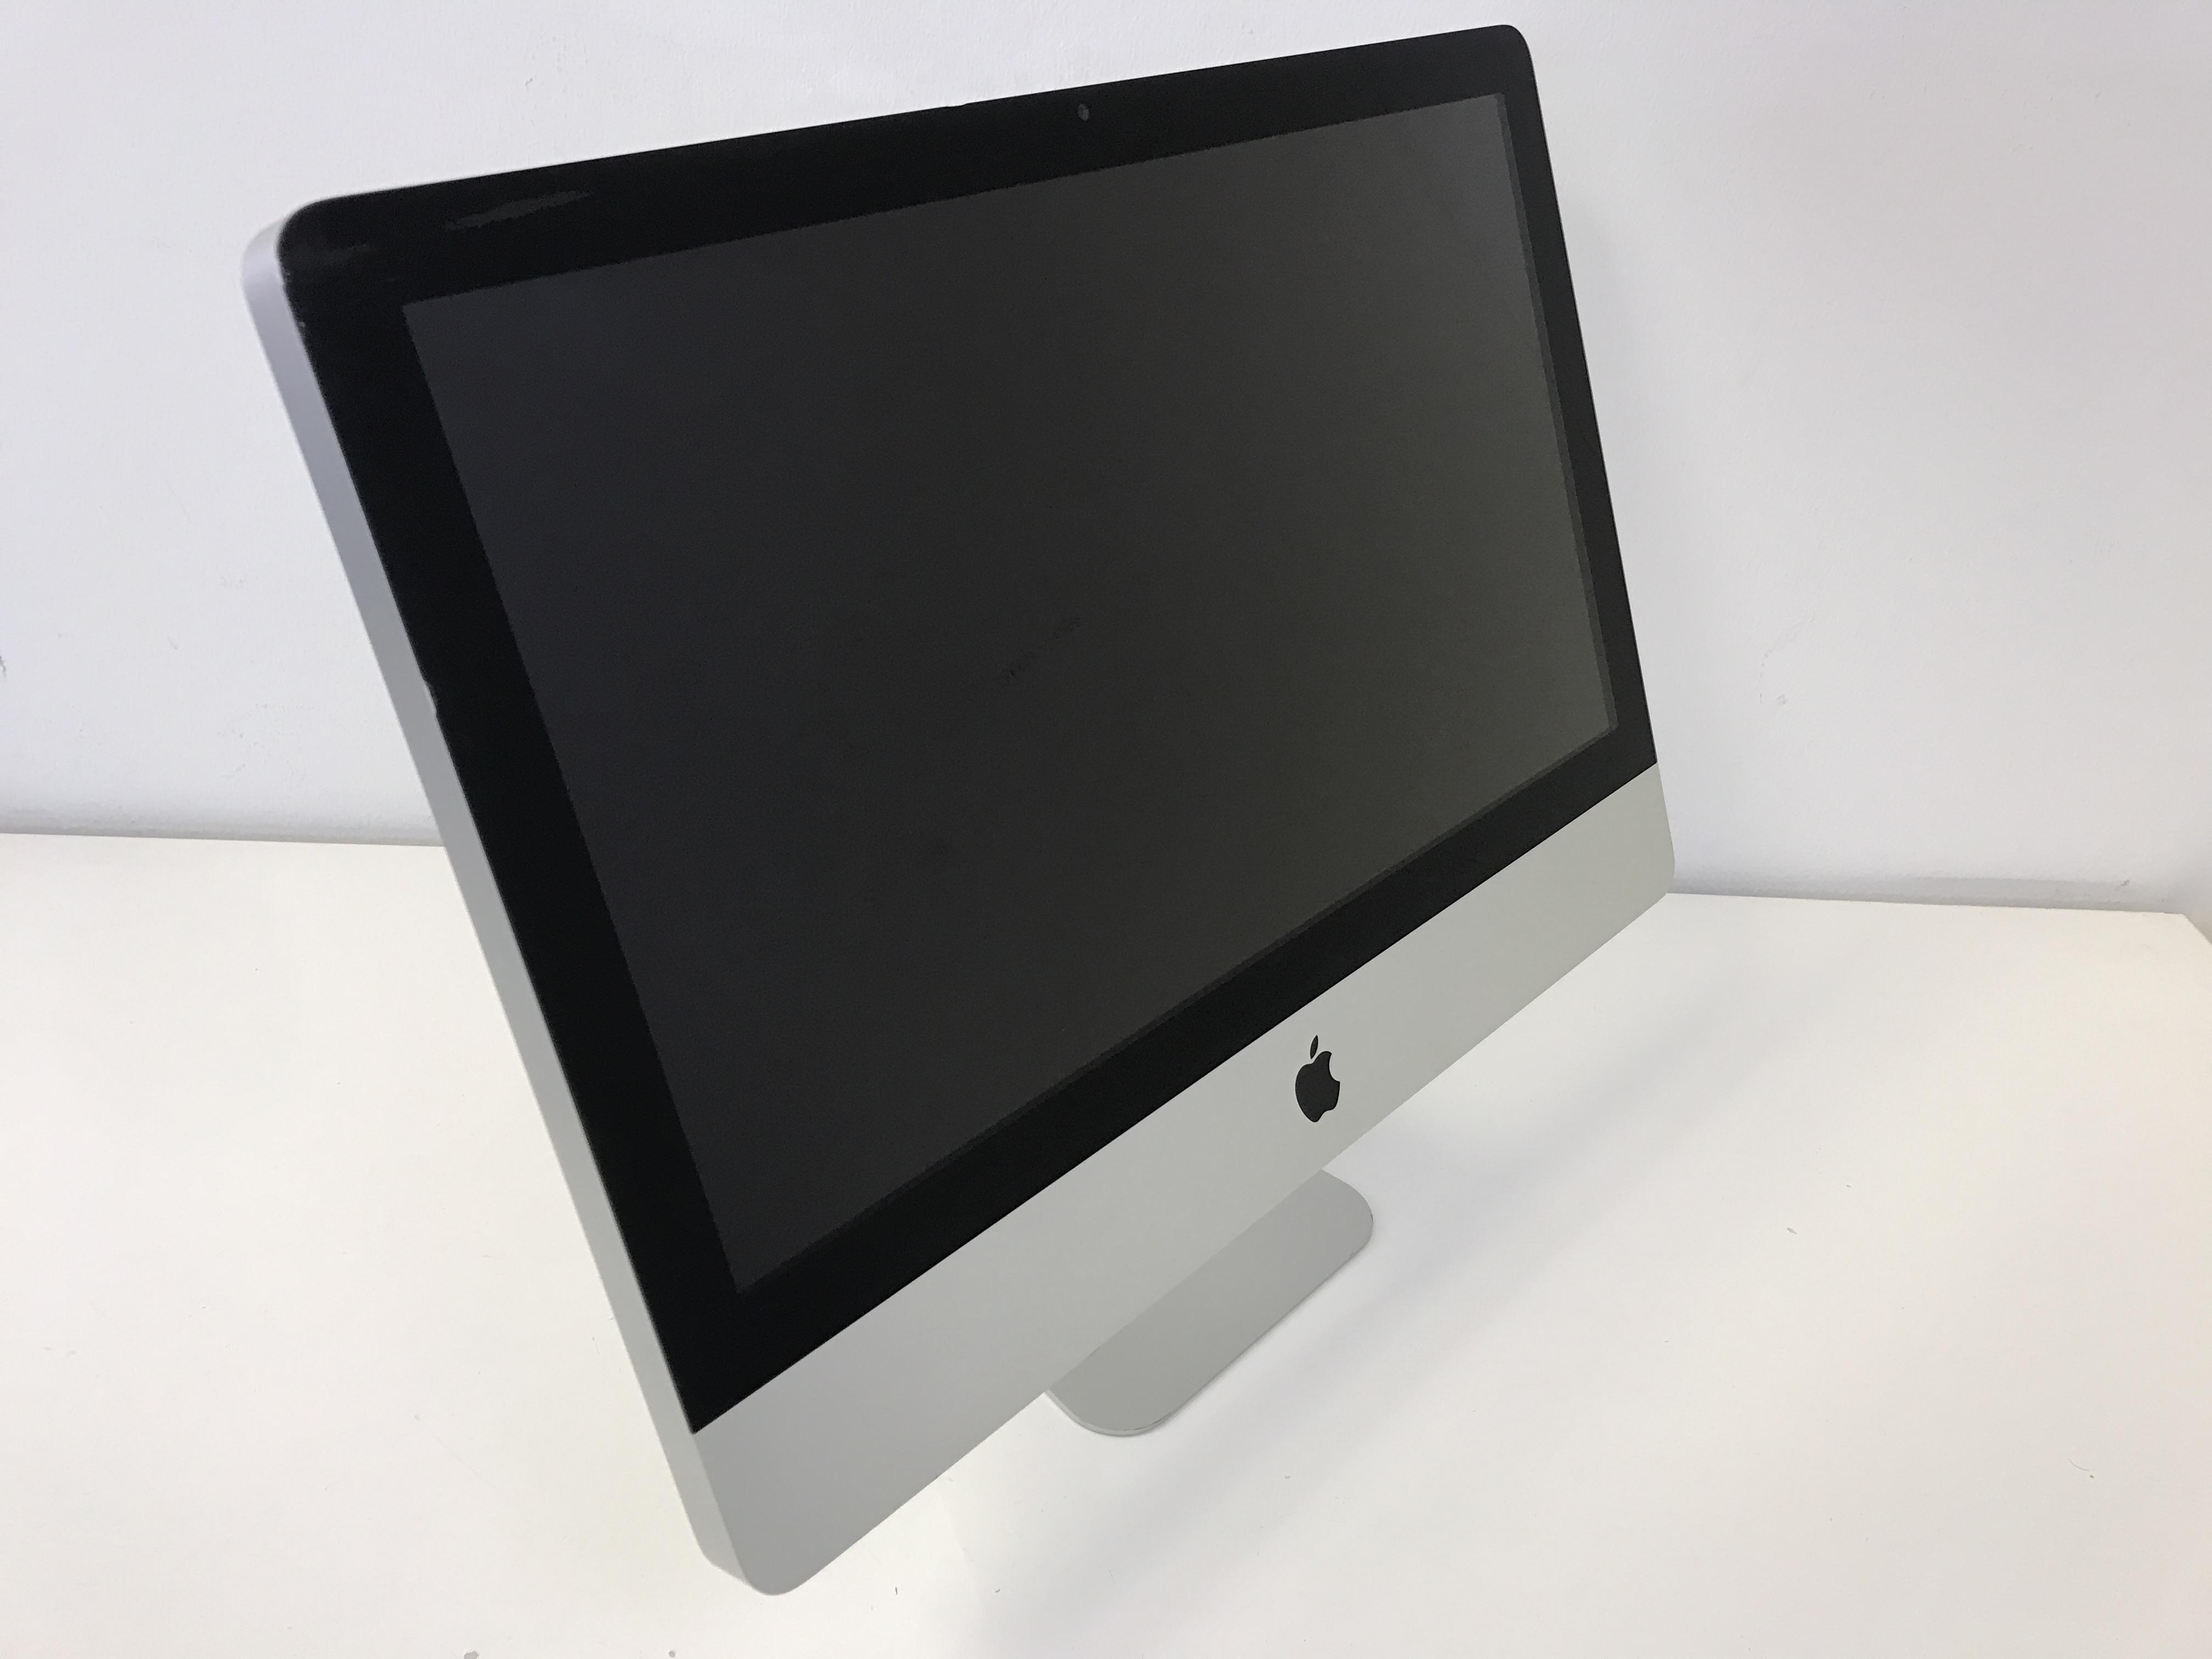 apple imac 21 5 mc508d a intel core i3 ghz 500 gb. Black Bedroom Furniture Sets. Home Design Ideas